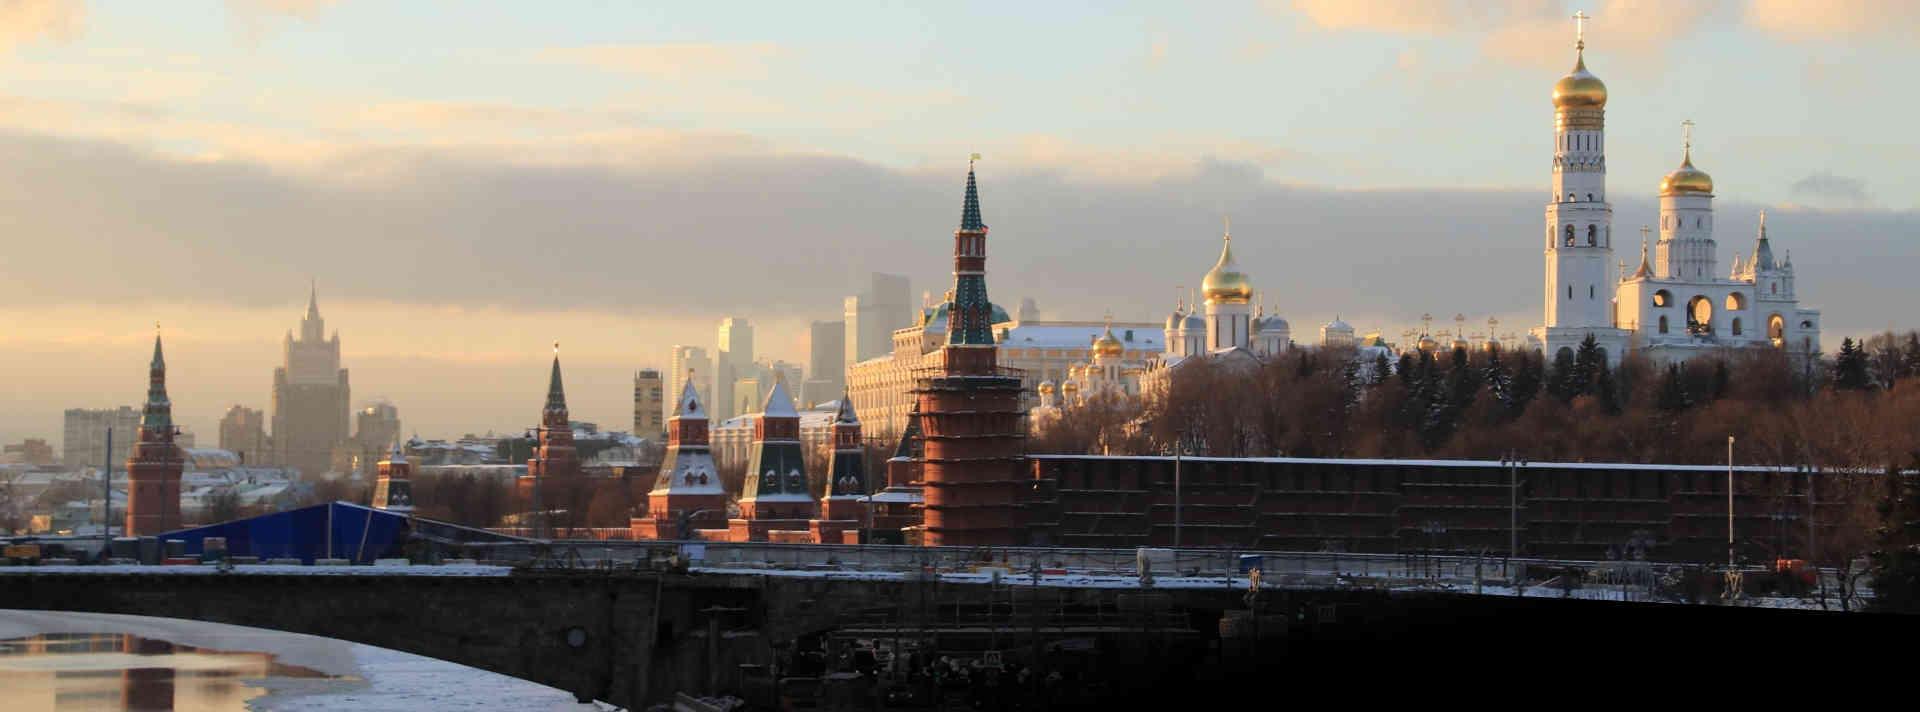 Kreml -Profesionalni ruski prevodilac - Halifax Beograd - Profesionalni prevod sa ruskog na srpski i na ruski sa srpskog